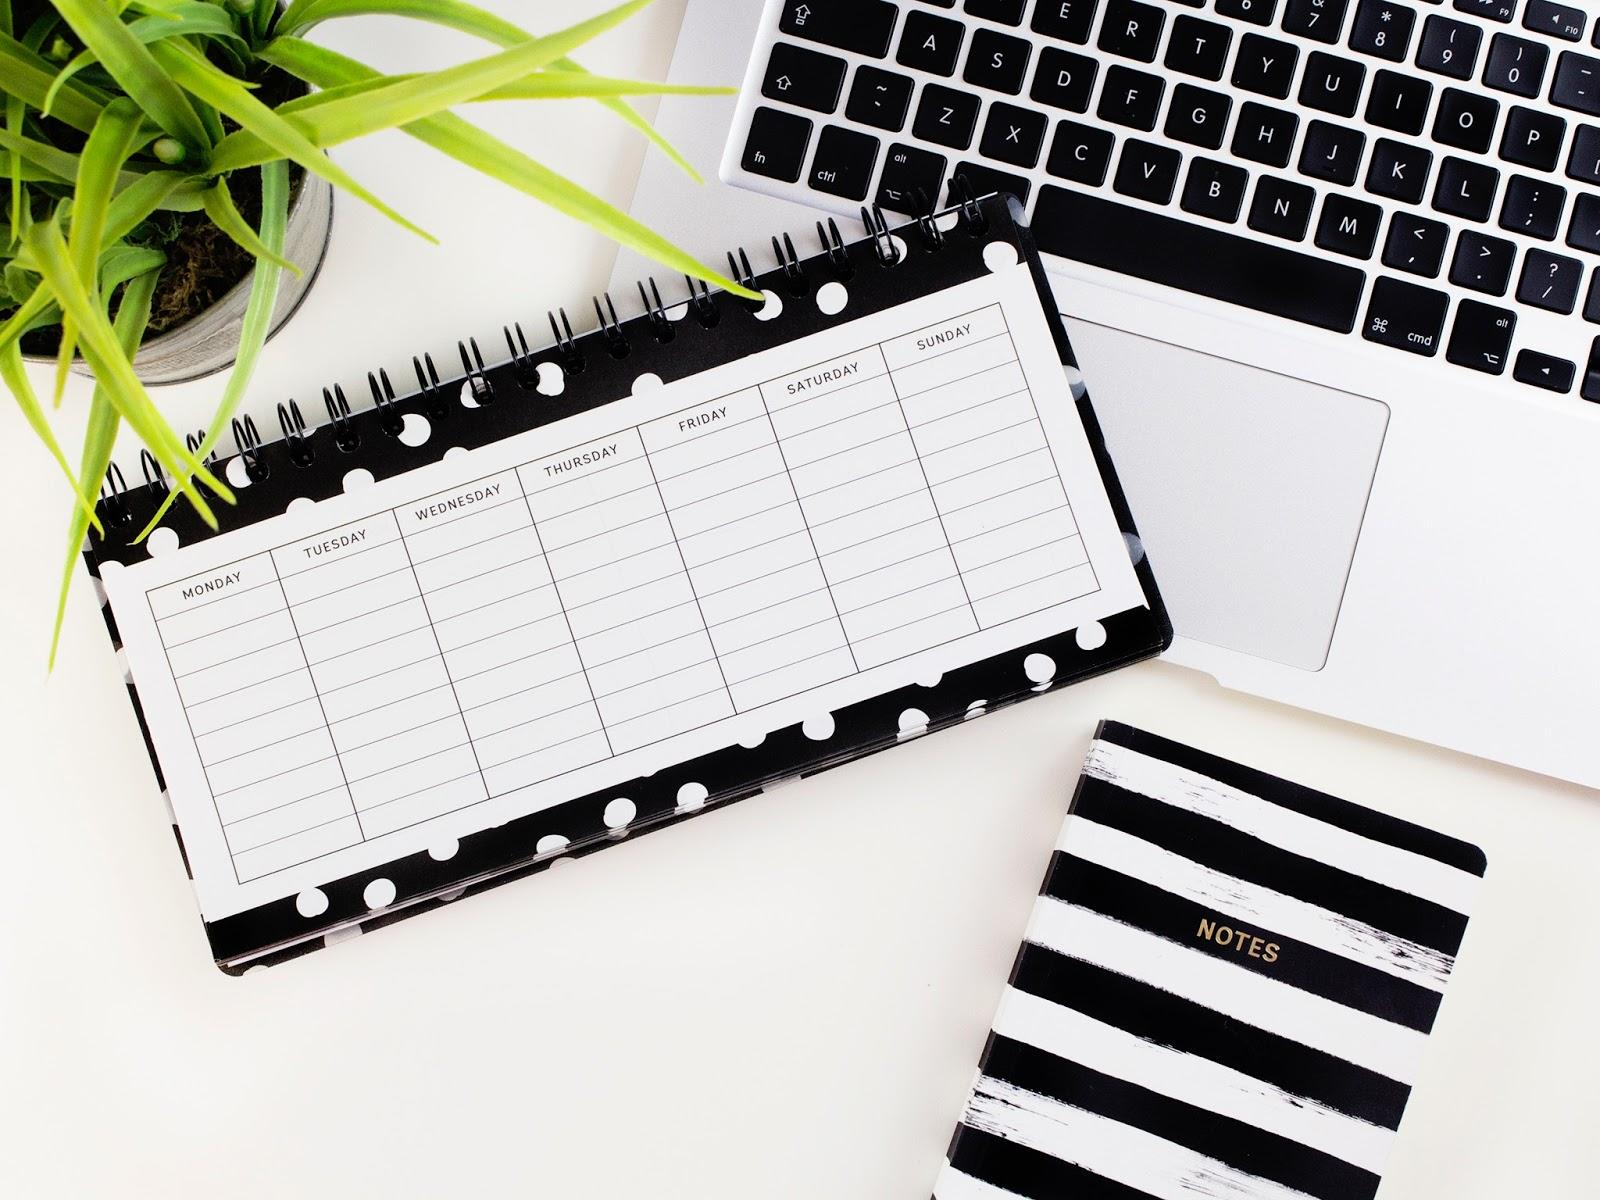 Easy ways to break your work week